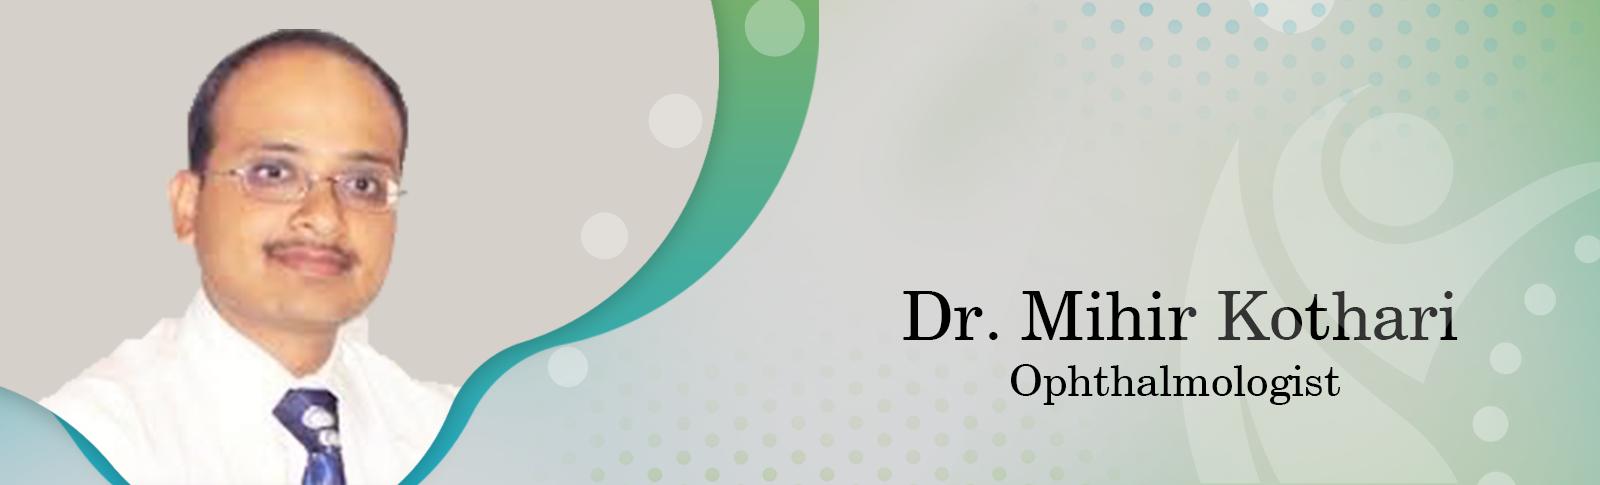 Dr. Mehar Kothari